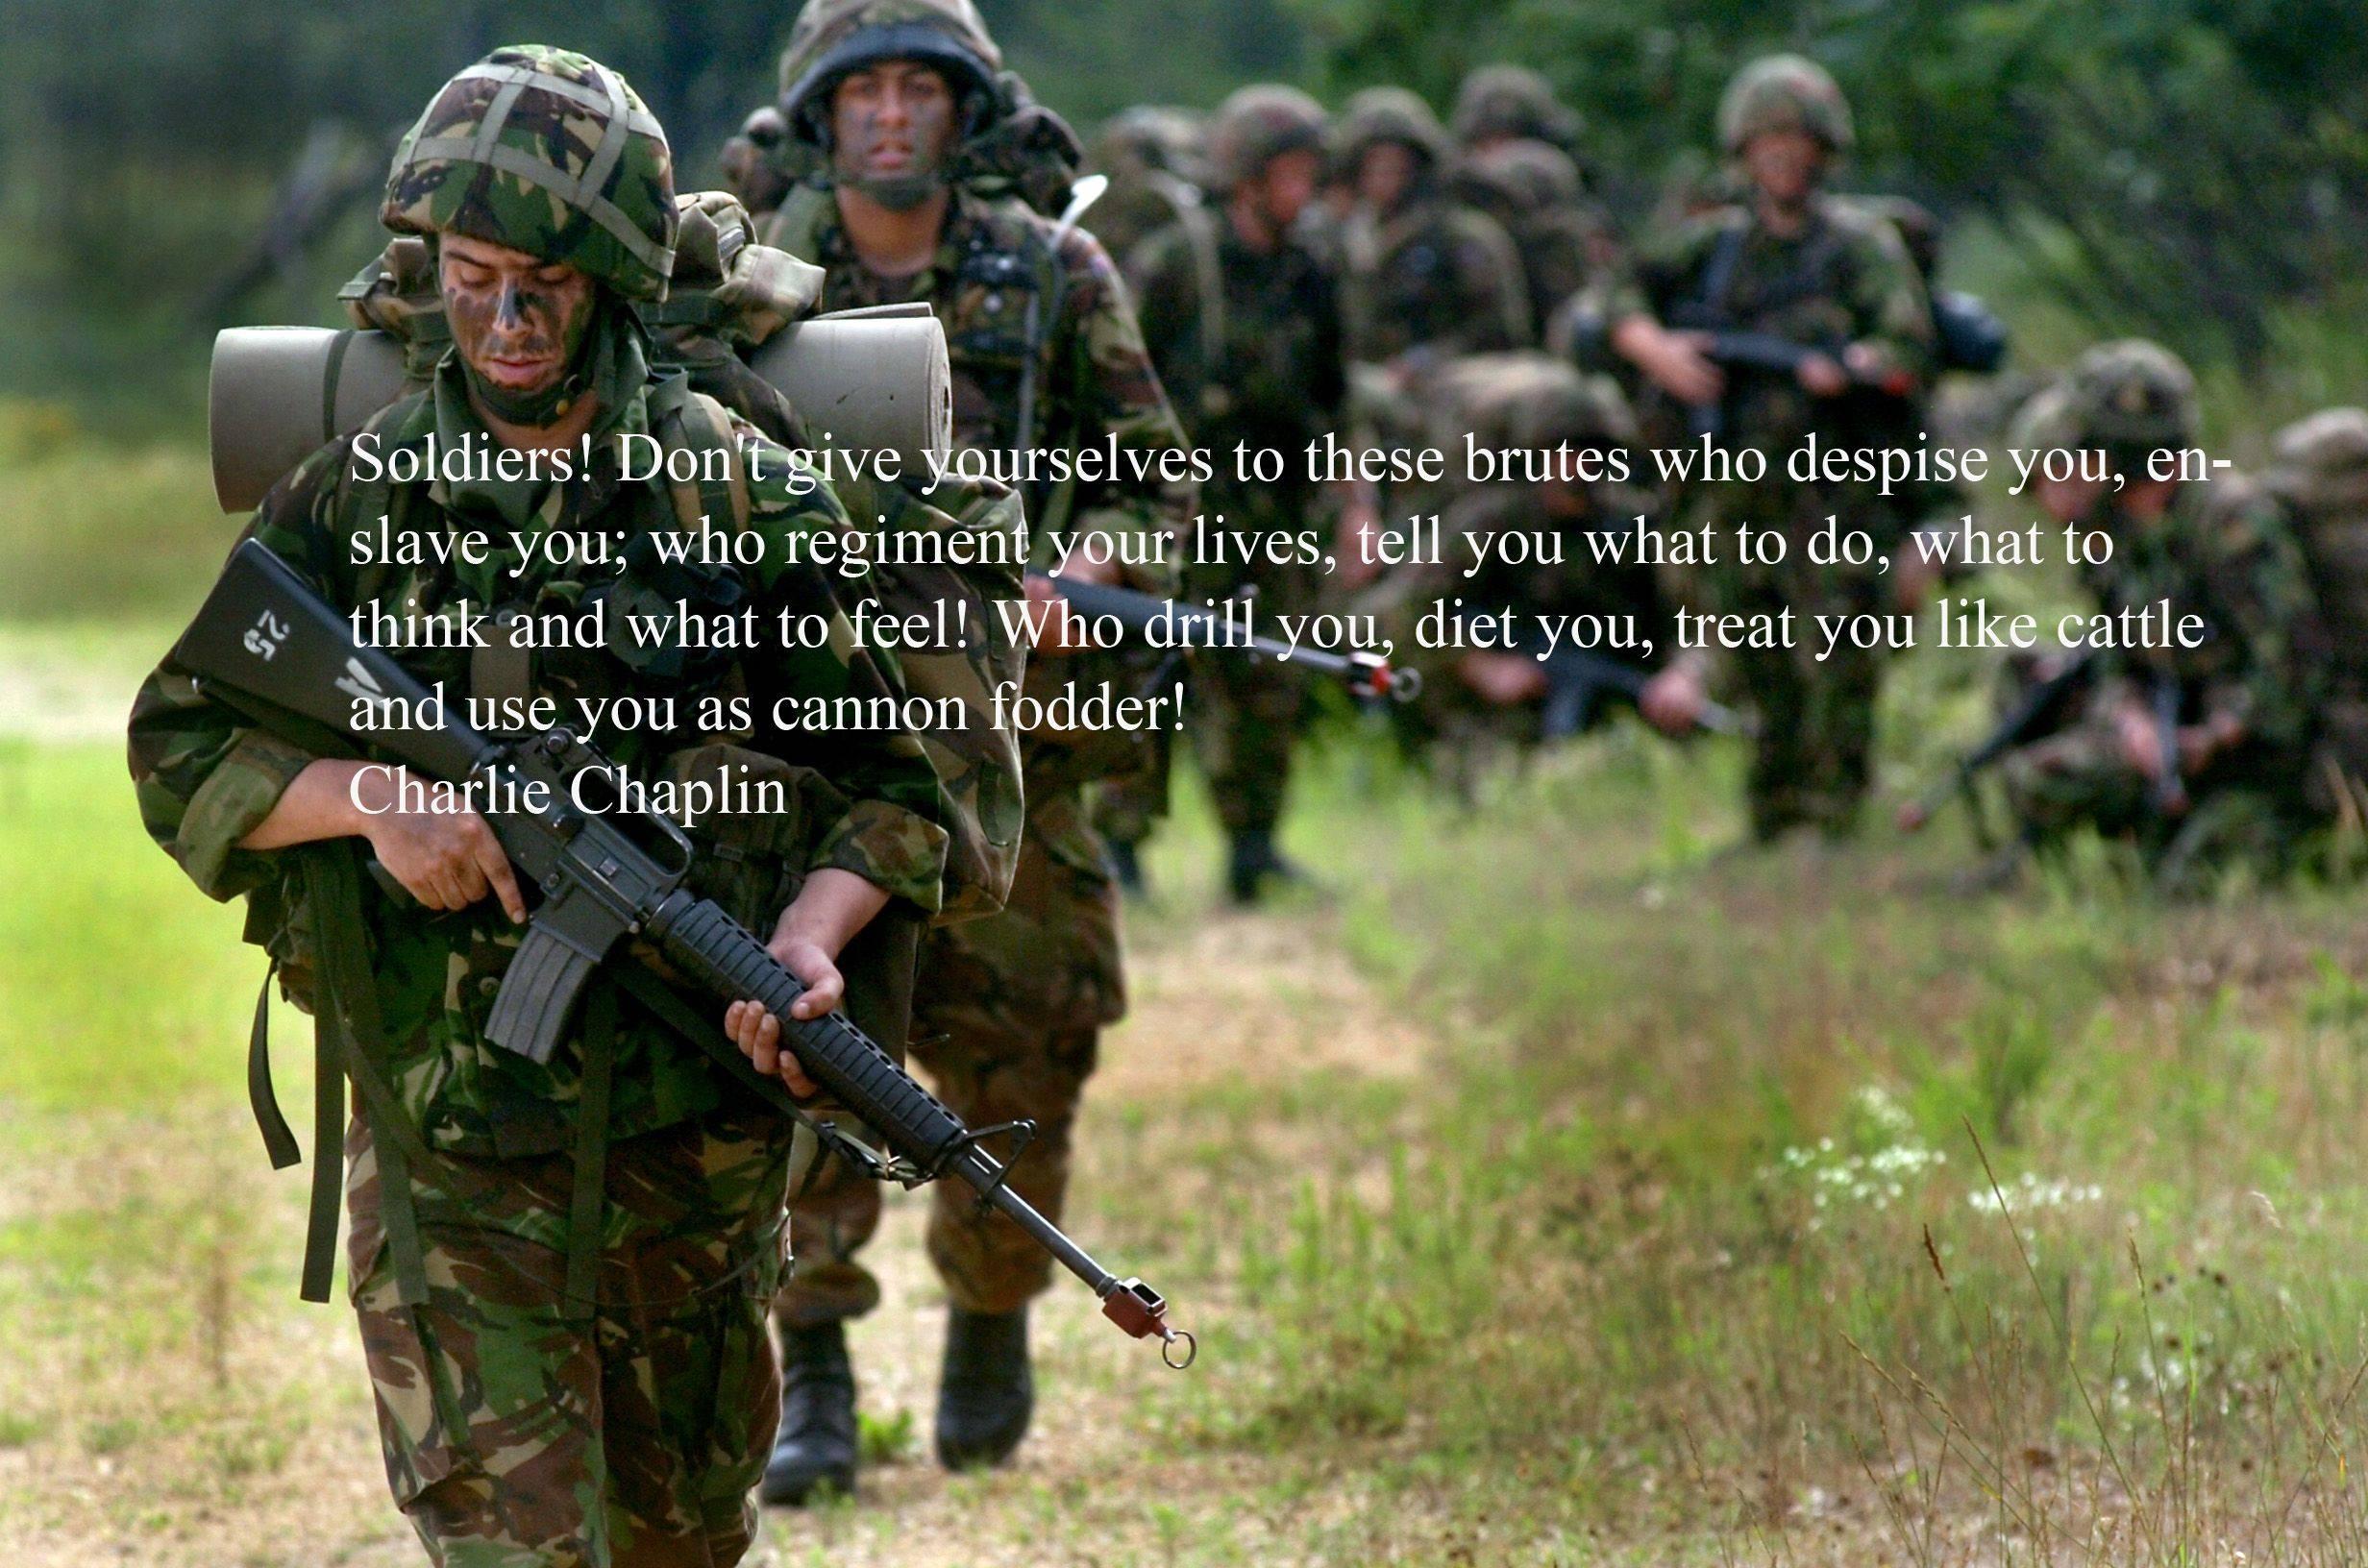 Biblical Soldiers Quotes. QuotesGram